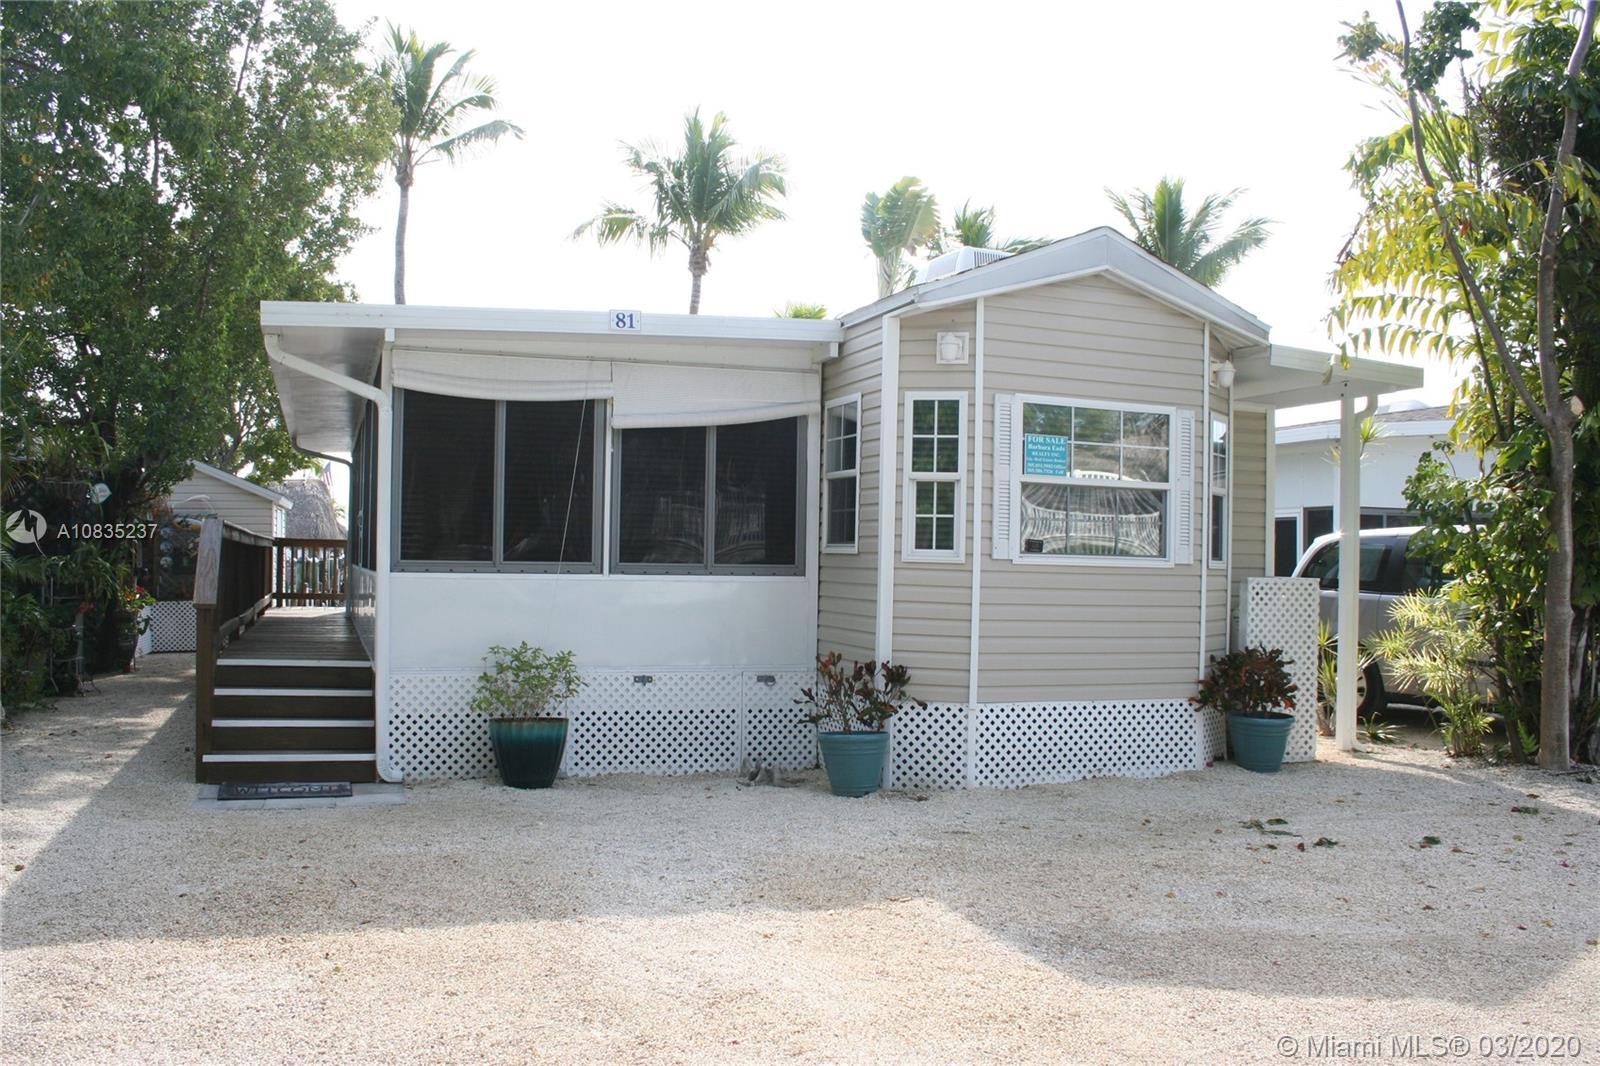 K L Kampground And Marina Real Estate Listings Main Image